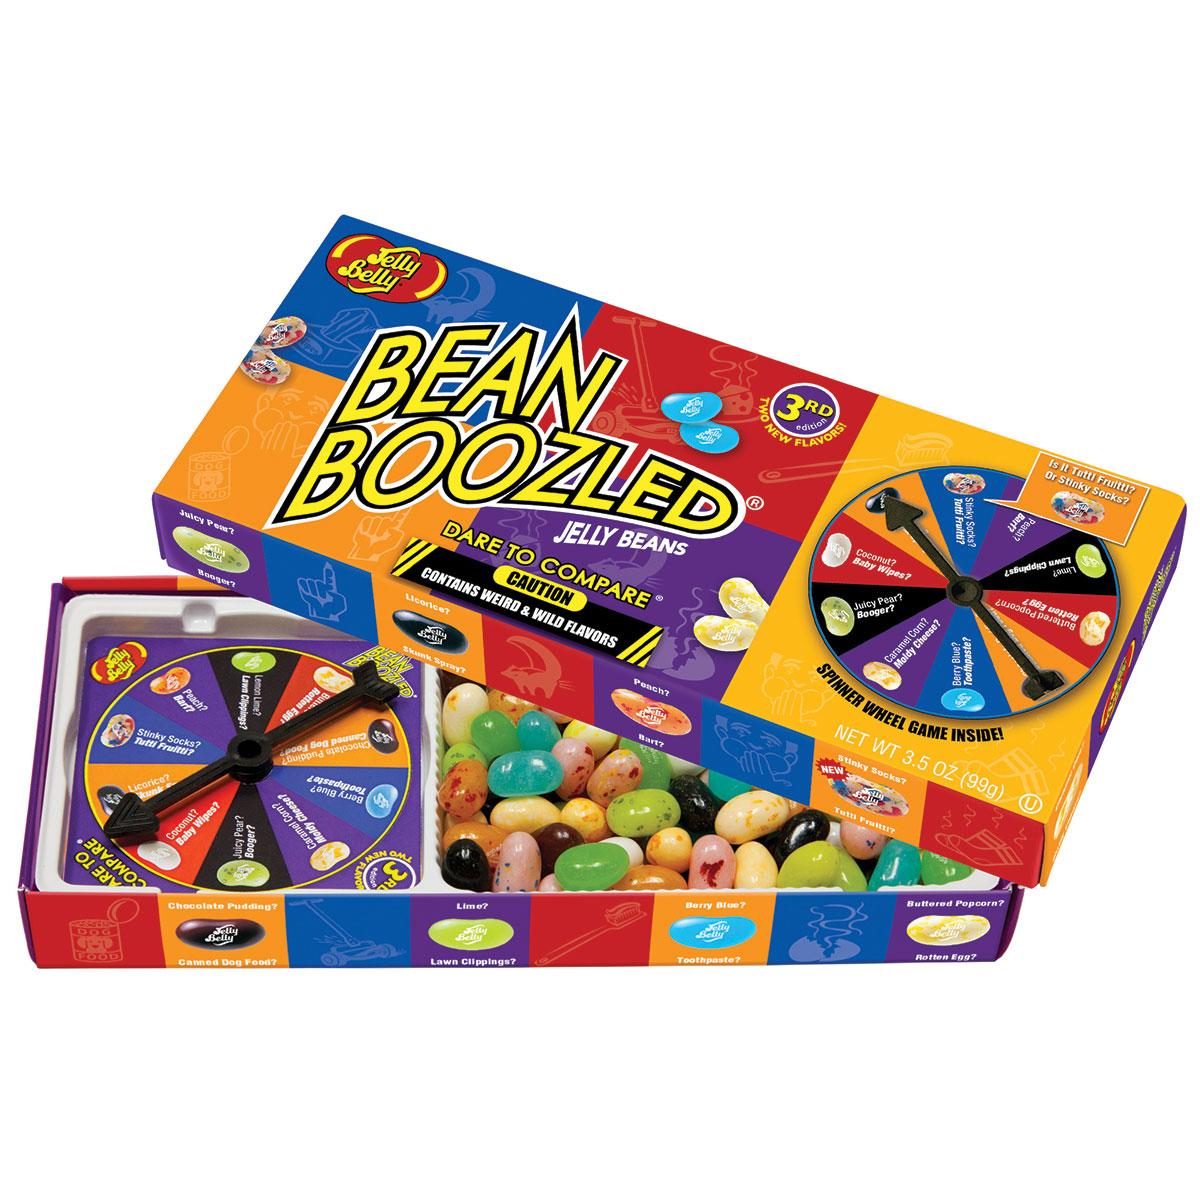 Jelly Belly Bean Boozled Game Драже жевательное + игра, 100 г 71567990516